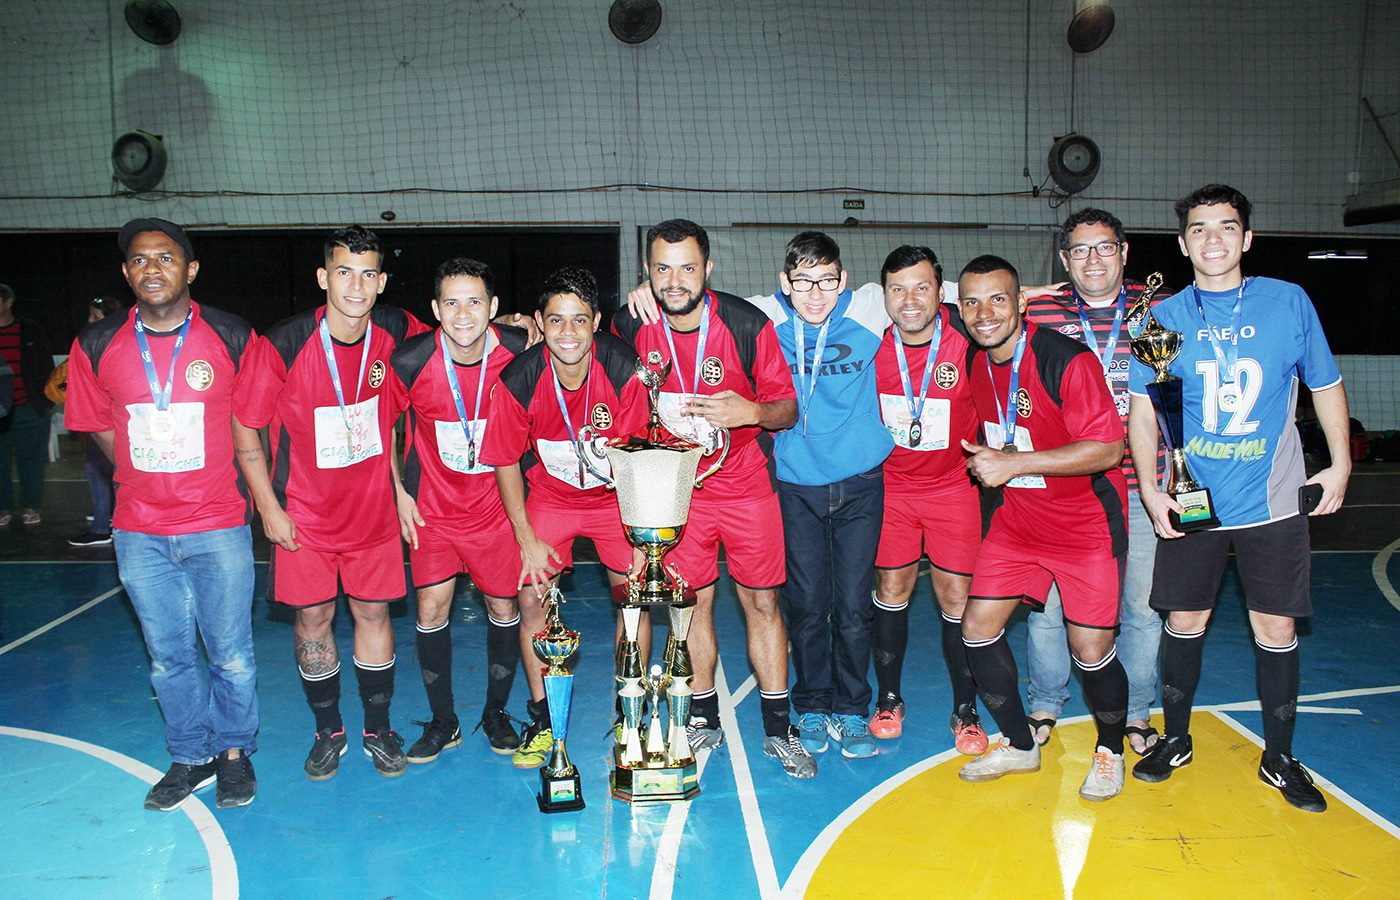 Madewal/ServBem vence 13ª Copa de Futsal do Sinecol